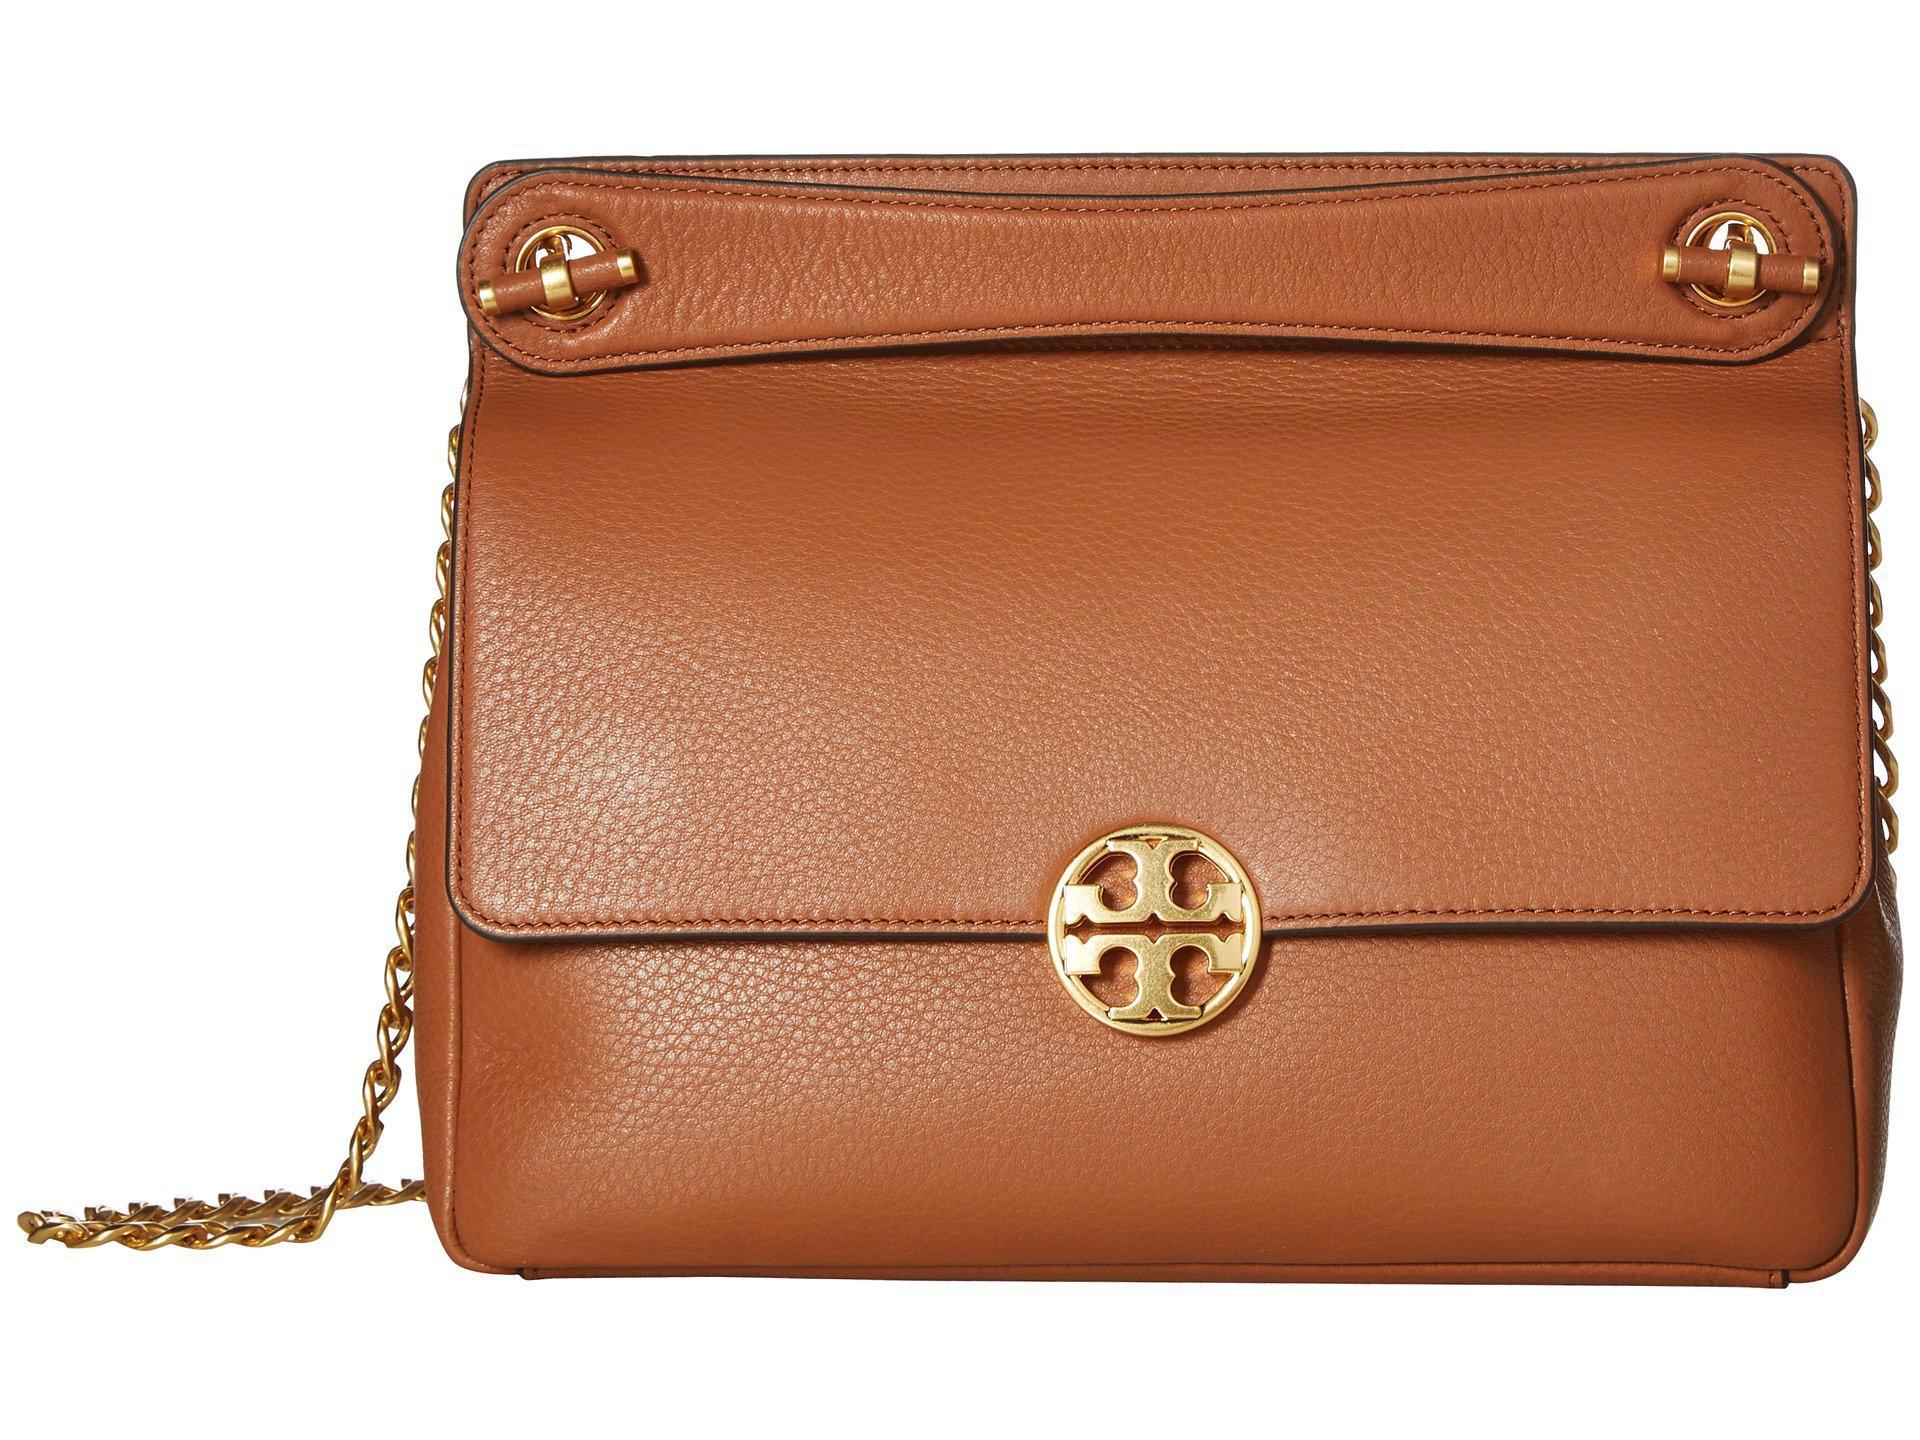 bb9efcde459 Lyst - Tory Burch Chelsea Flap Shoulder Bag (classic Tan) Shoulder ...